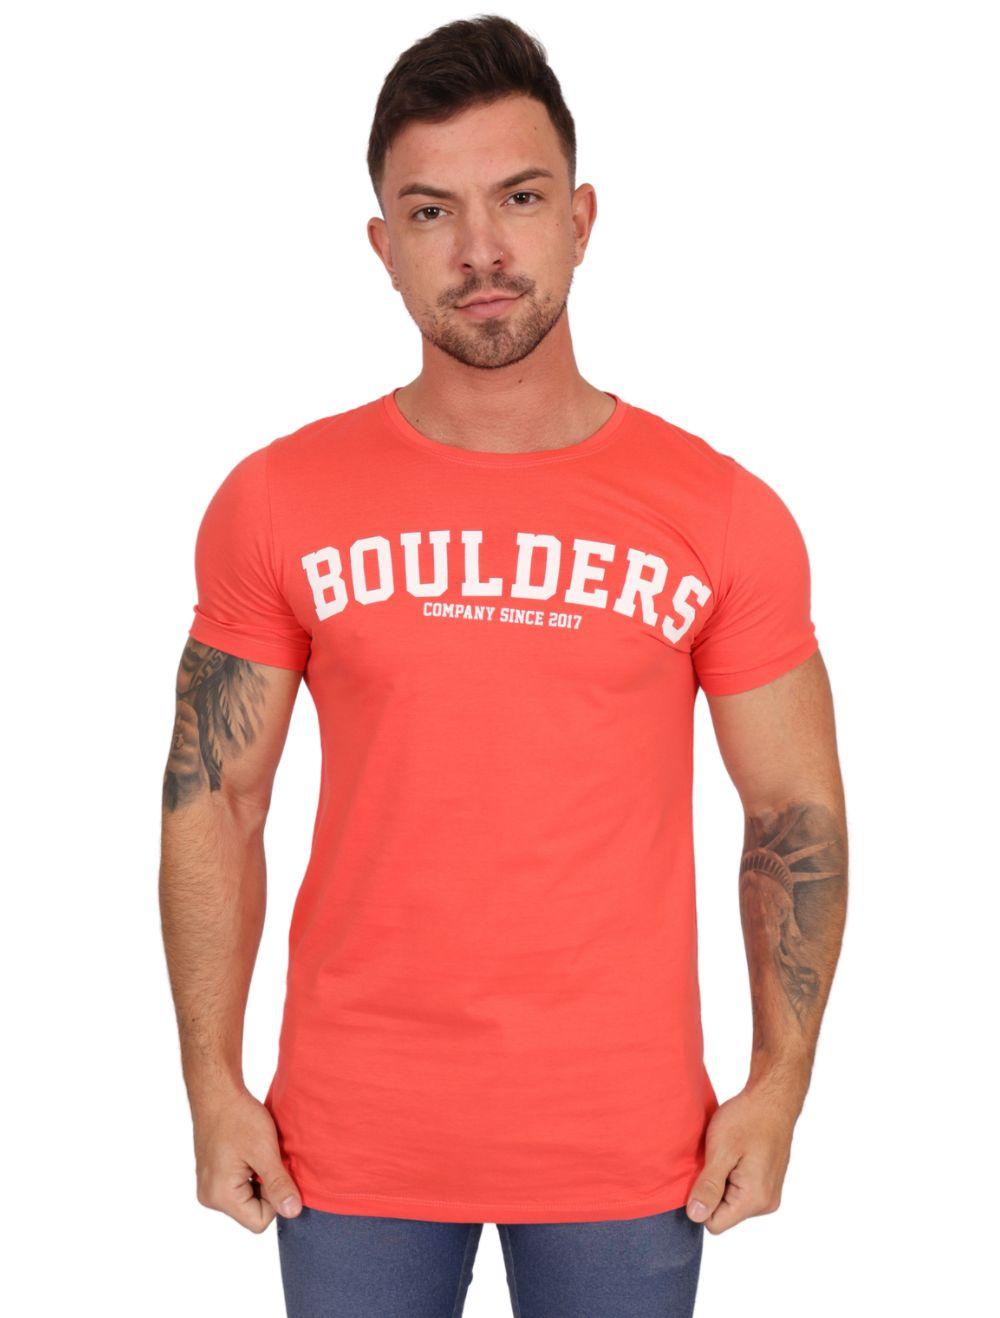 Camiseta Long Vermelha Masculina Boulders Since 2017